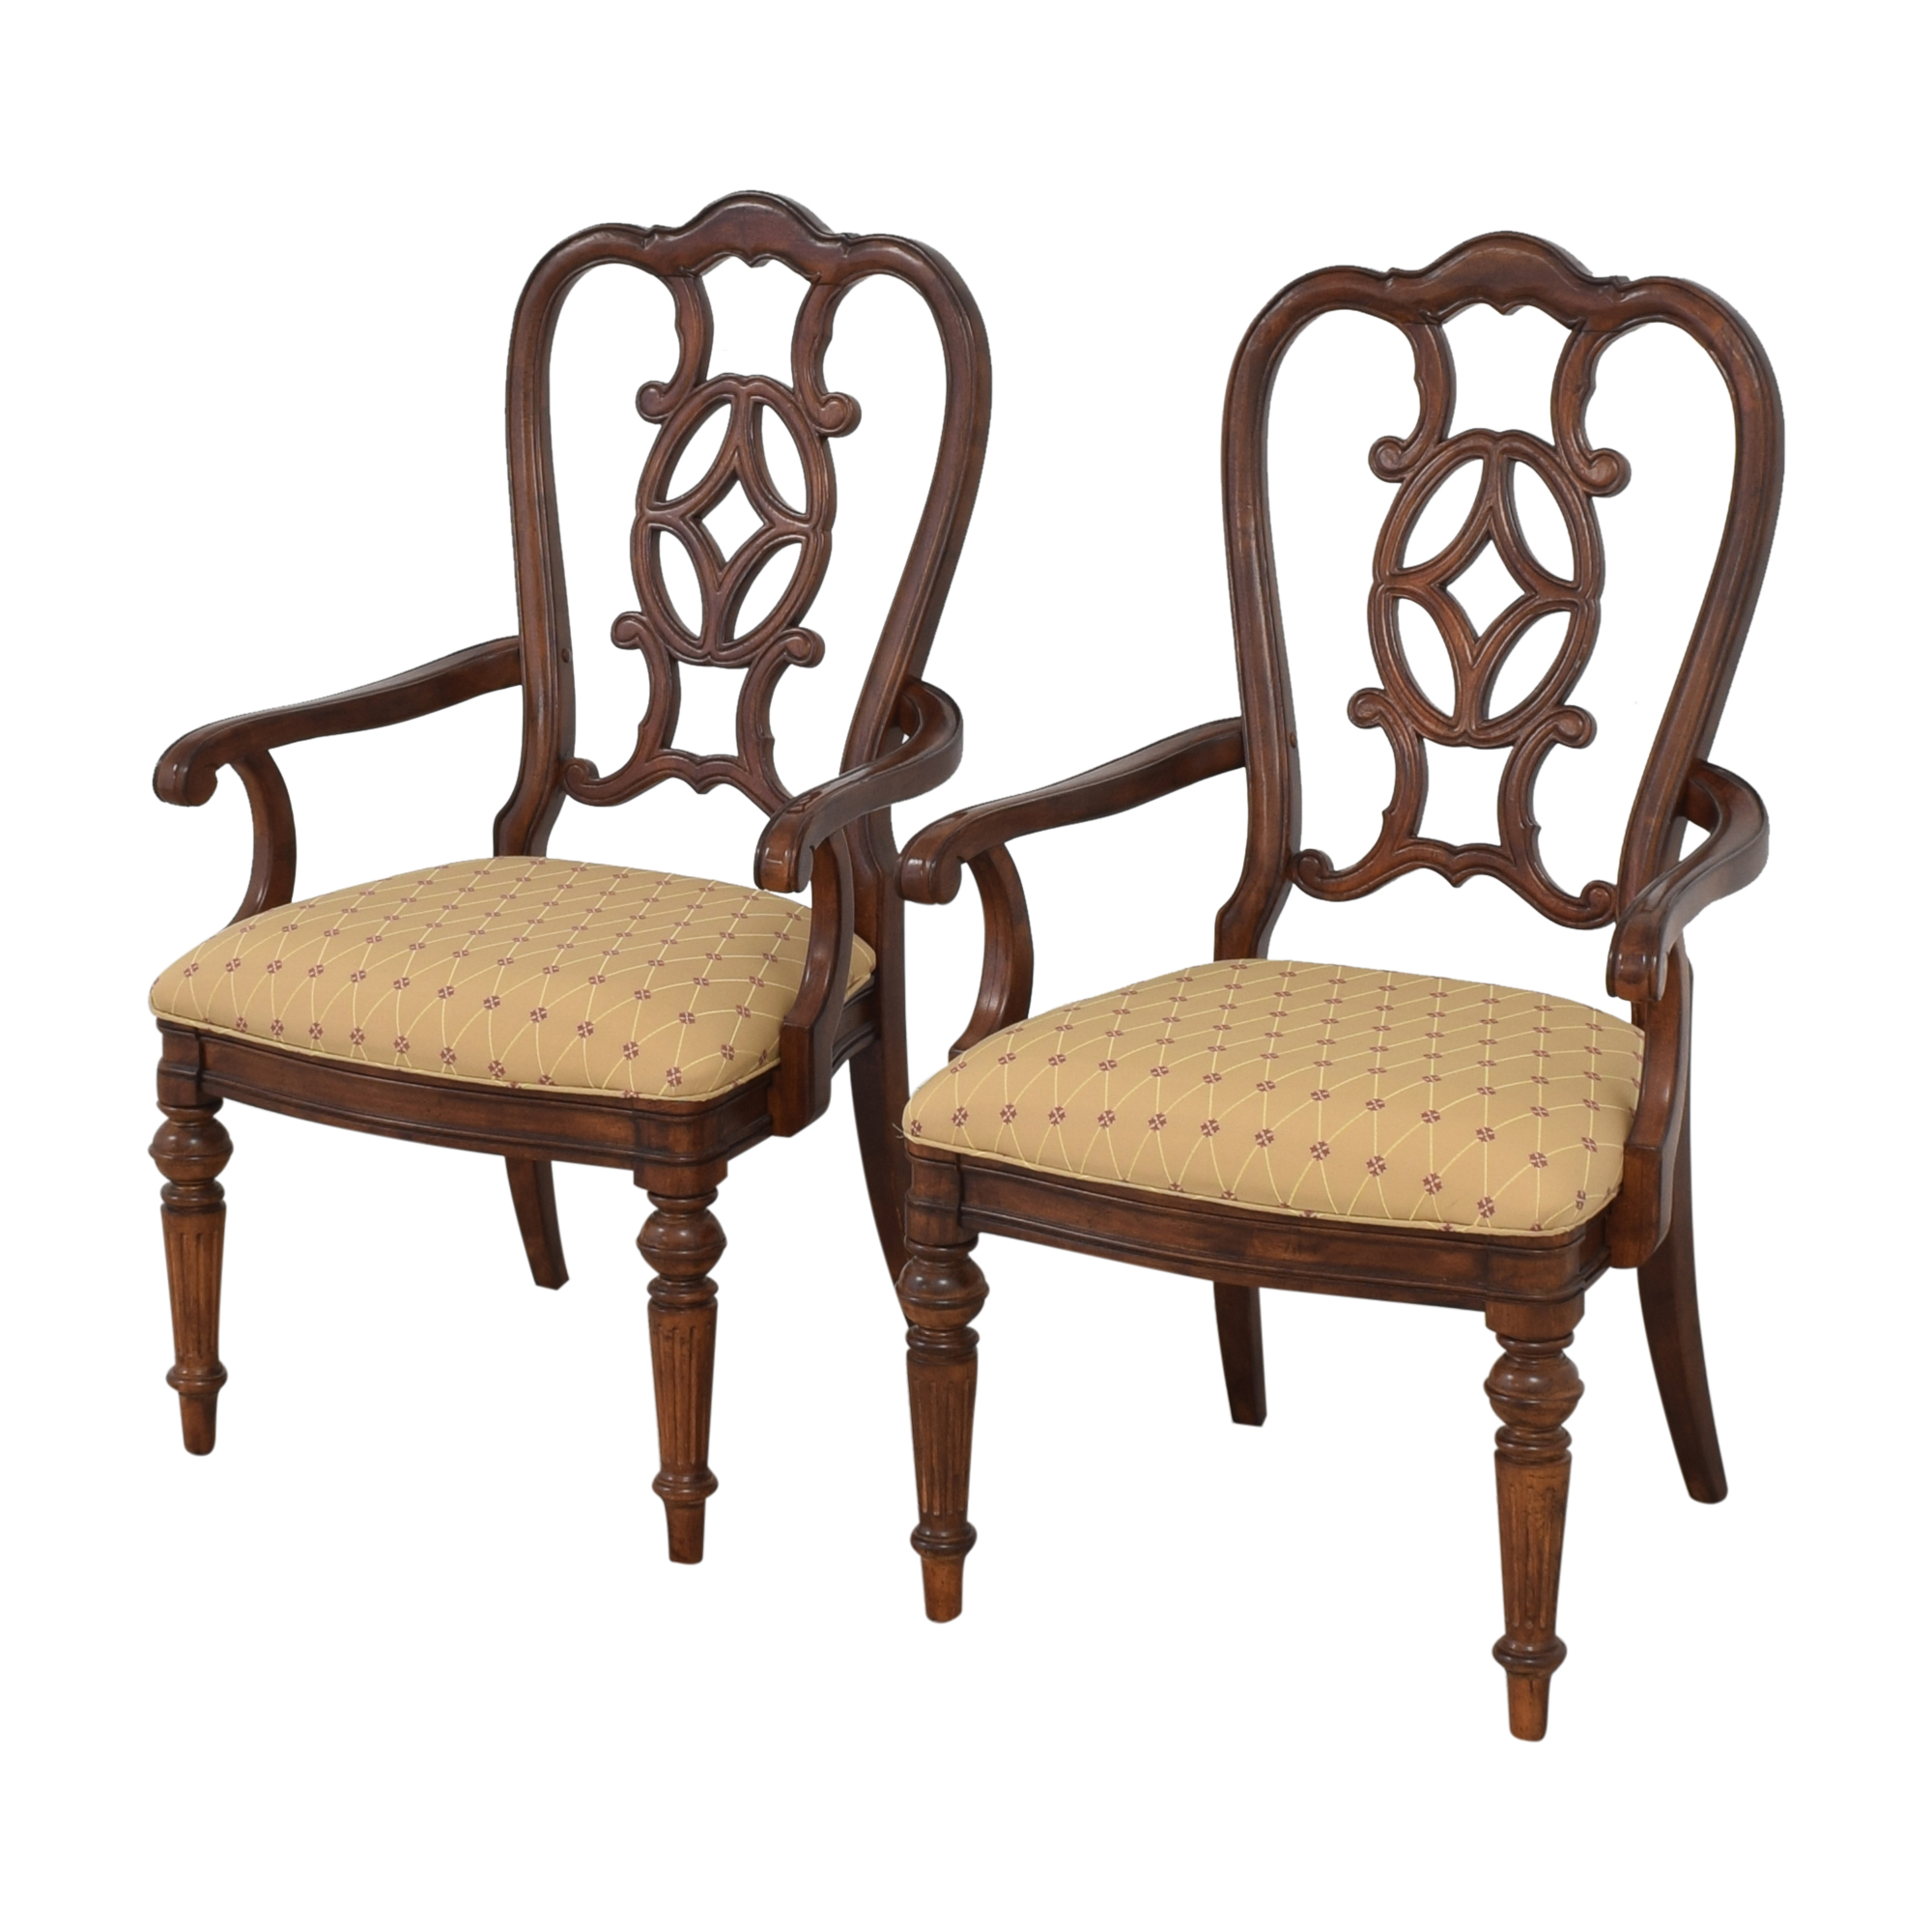 Thomasville Thomasville Dining Arm Chairs ct